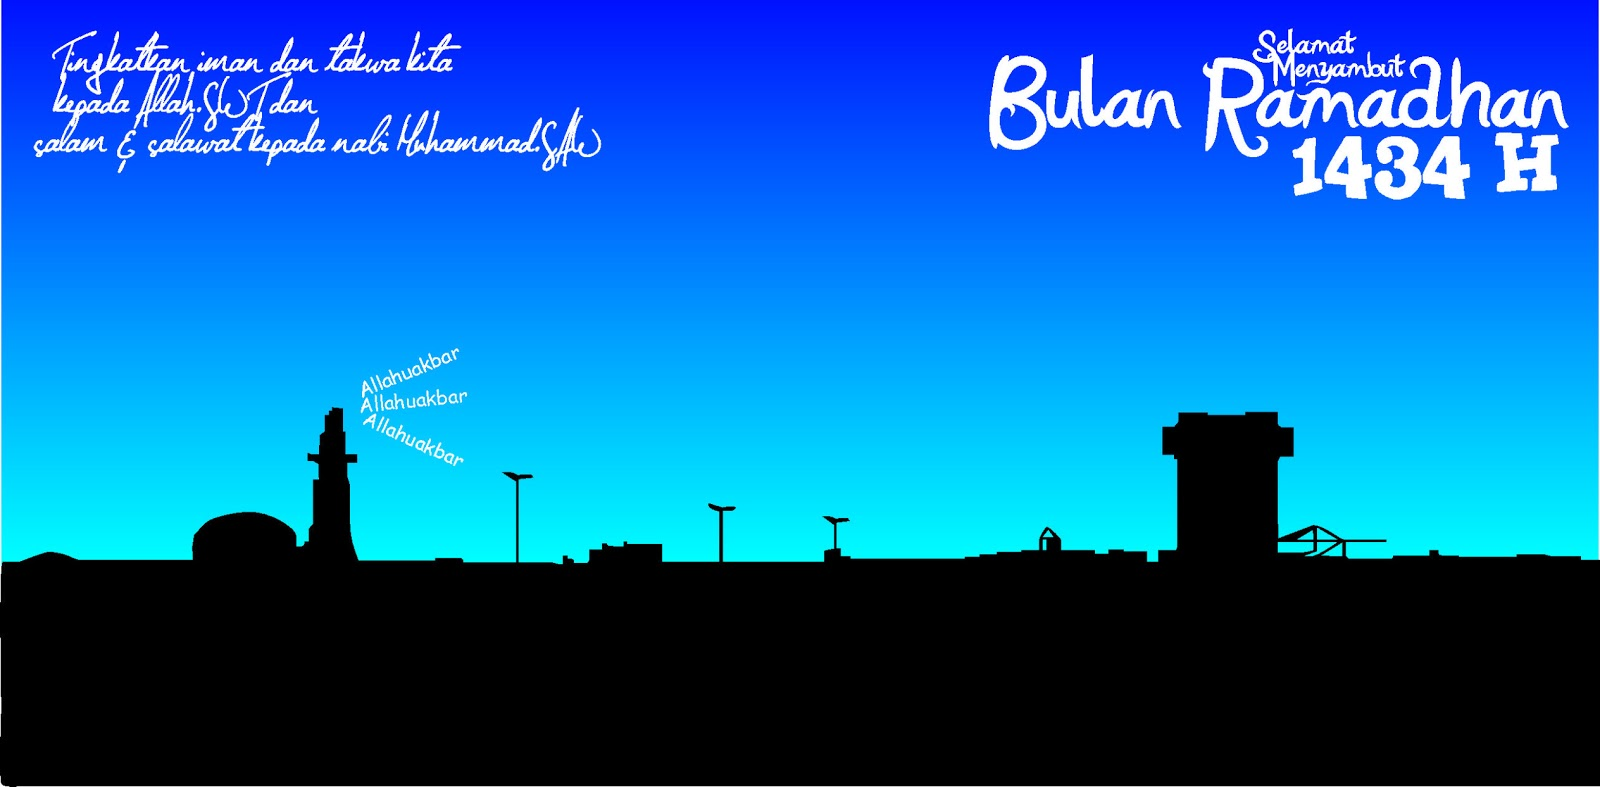 20 Selamat Ramadhan Inspirations Kata Mutiara Terbaru